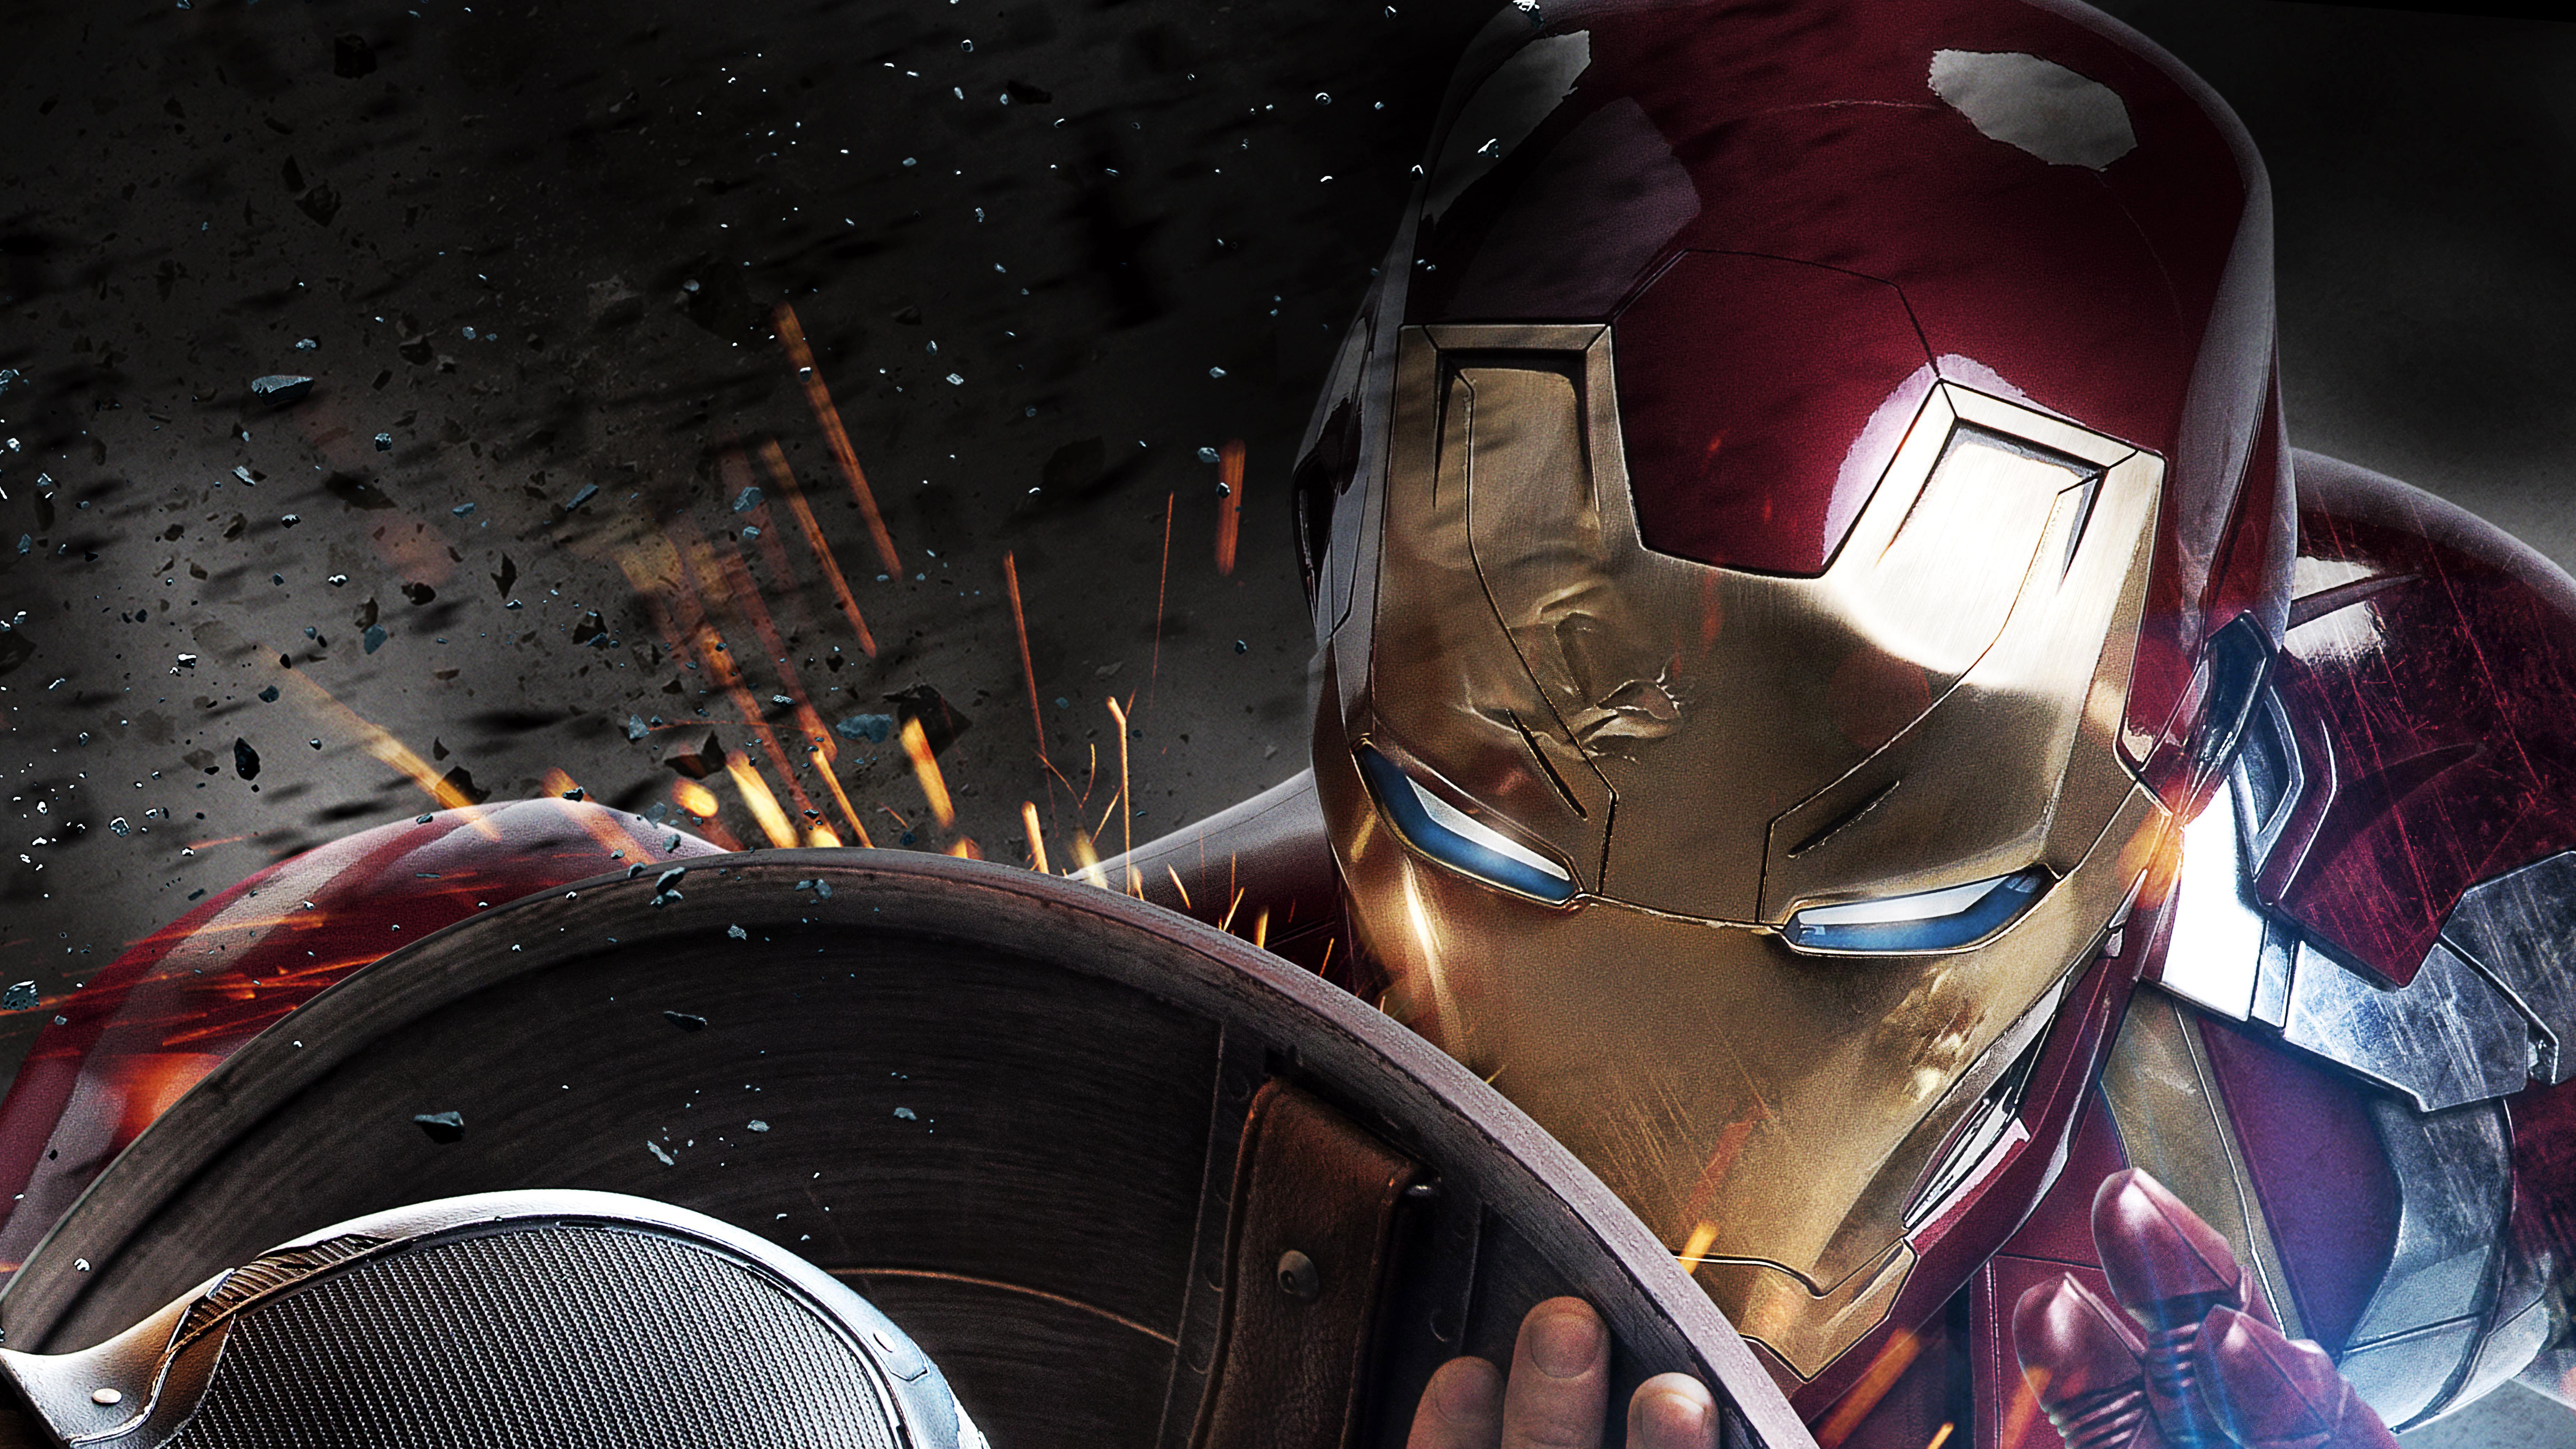 4K Superhero Wallpapers - Top Free 4K Superhero ...